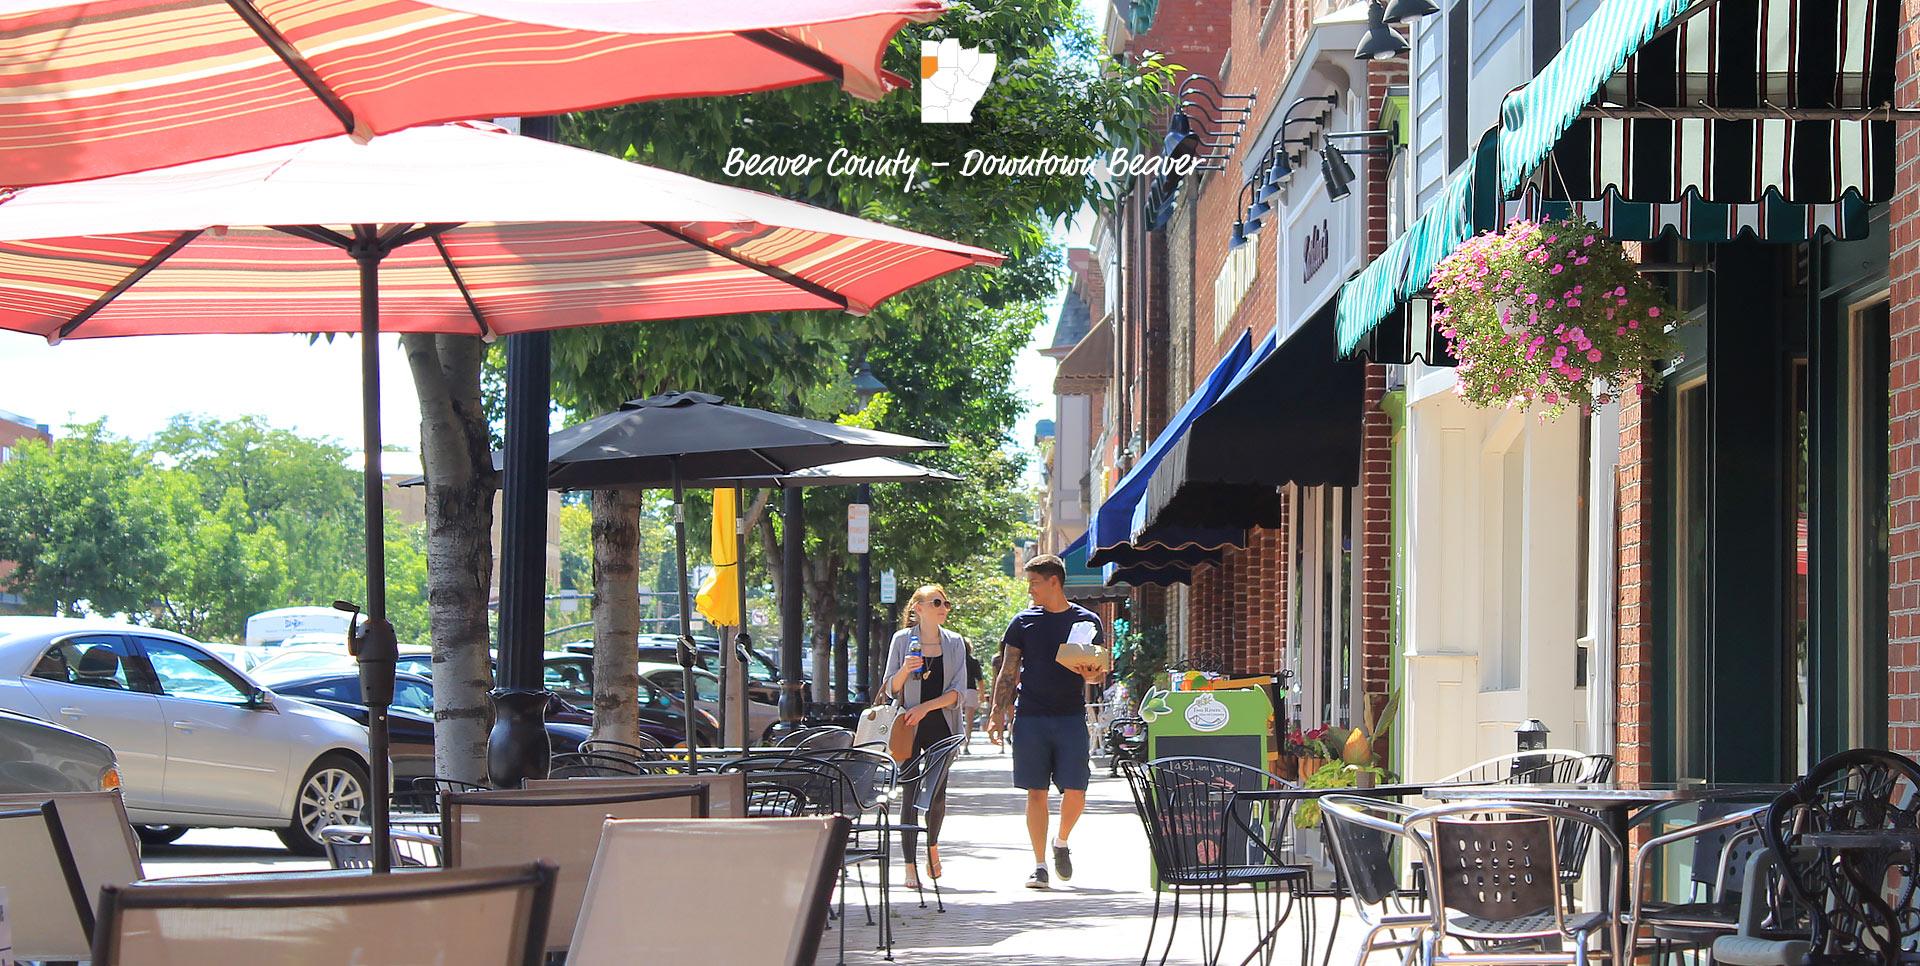 Beaver County – Downtown Beaver